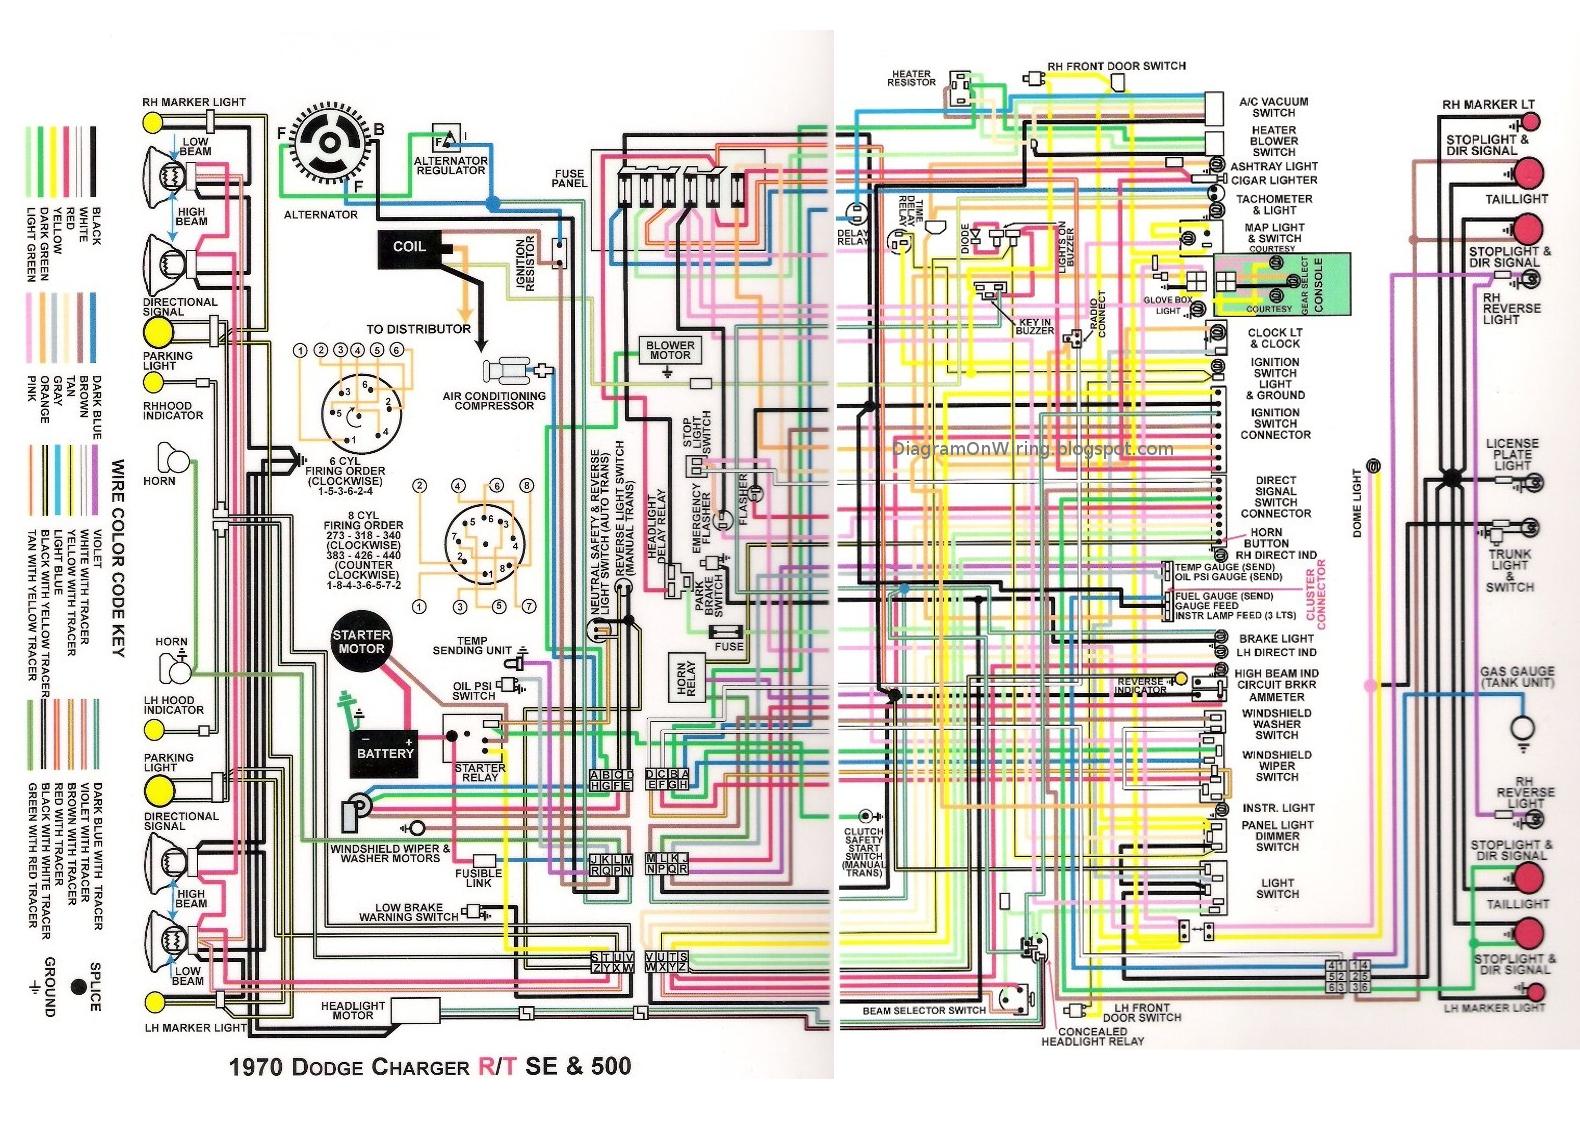 Erfreut 66 Impala Ss Schaltplan Ideen - Der Schaltplan - triangre.info